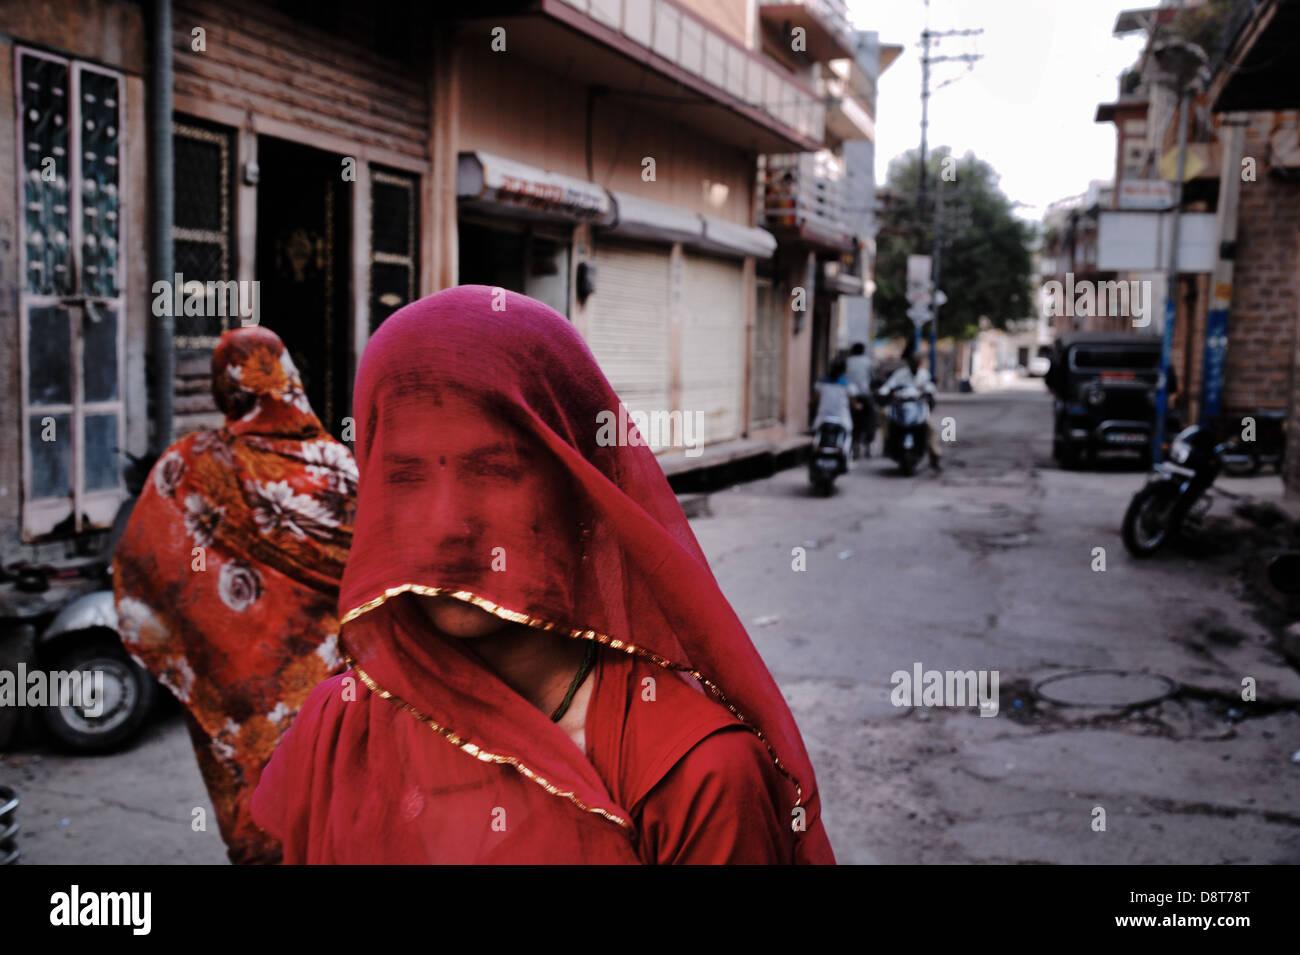 Street Scene Jodhpur, Rajasthan, India - Stock Image